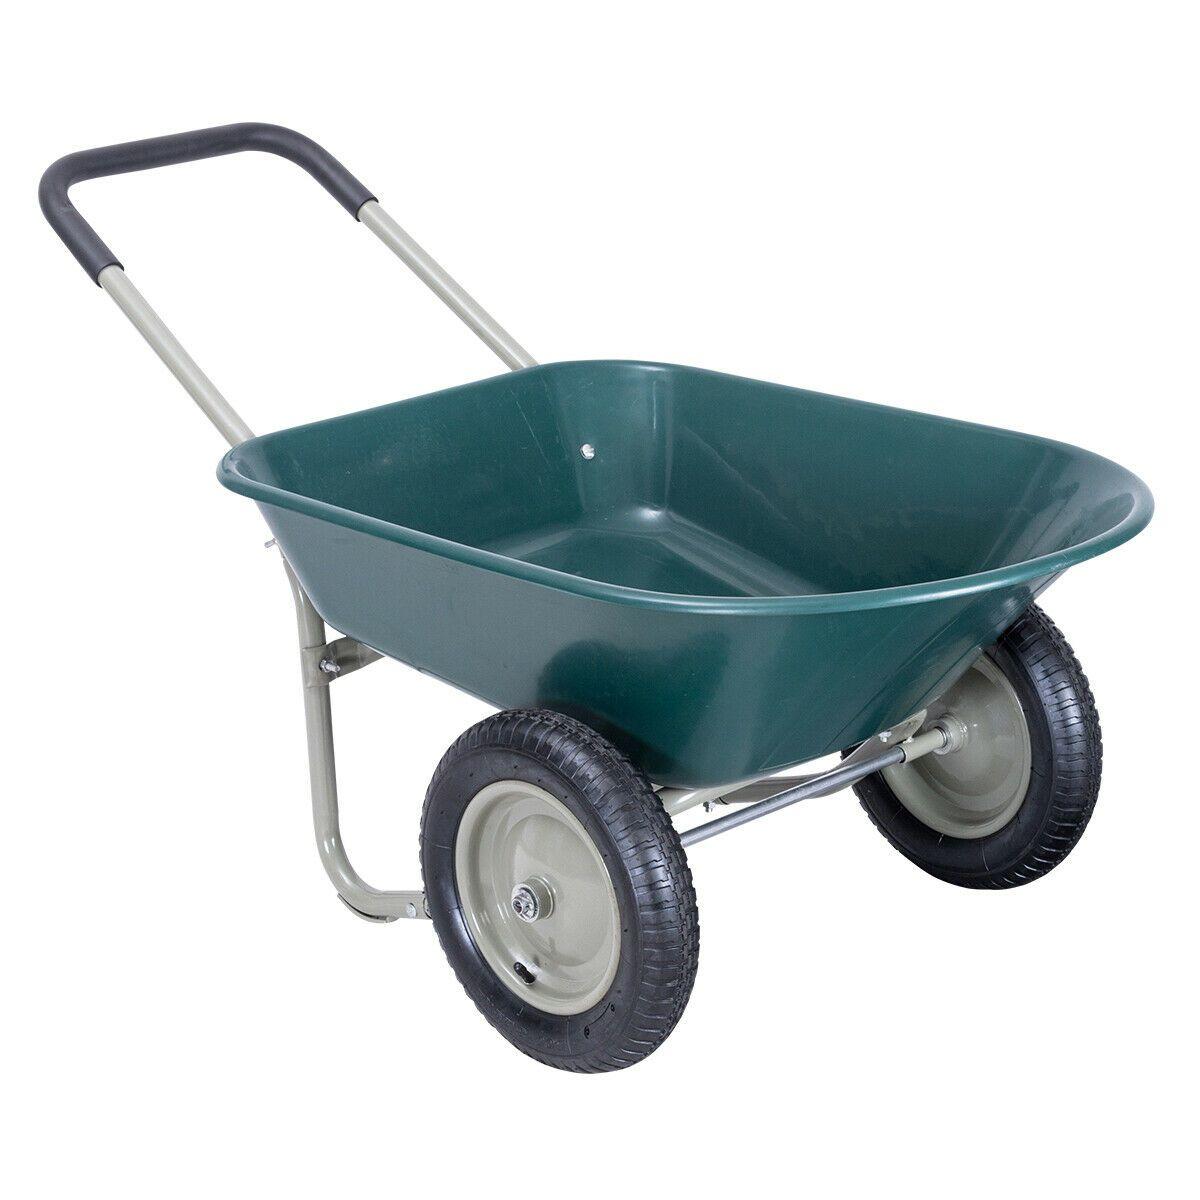 2 Tire Wheelbarrow Garden Cart Heavy Duty Dolly Utility Cart In